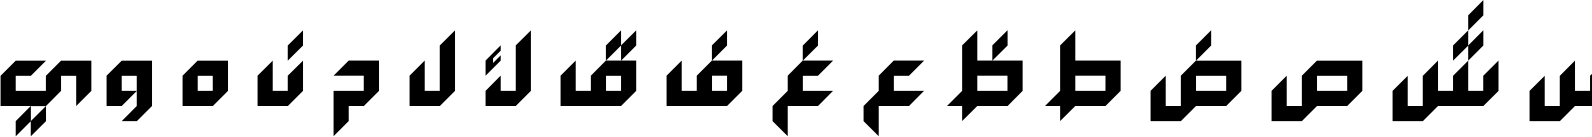 Arabigram